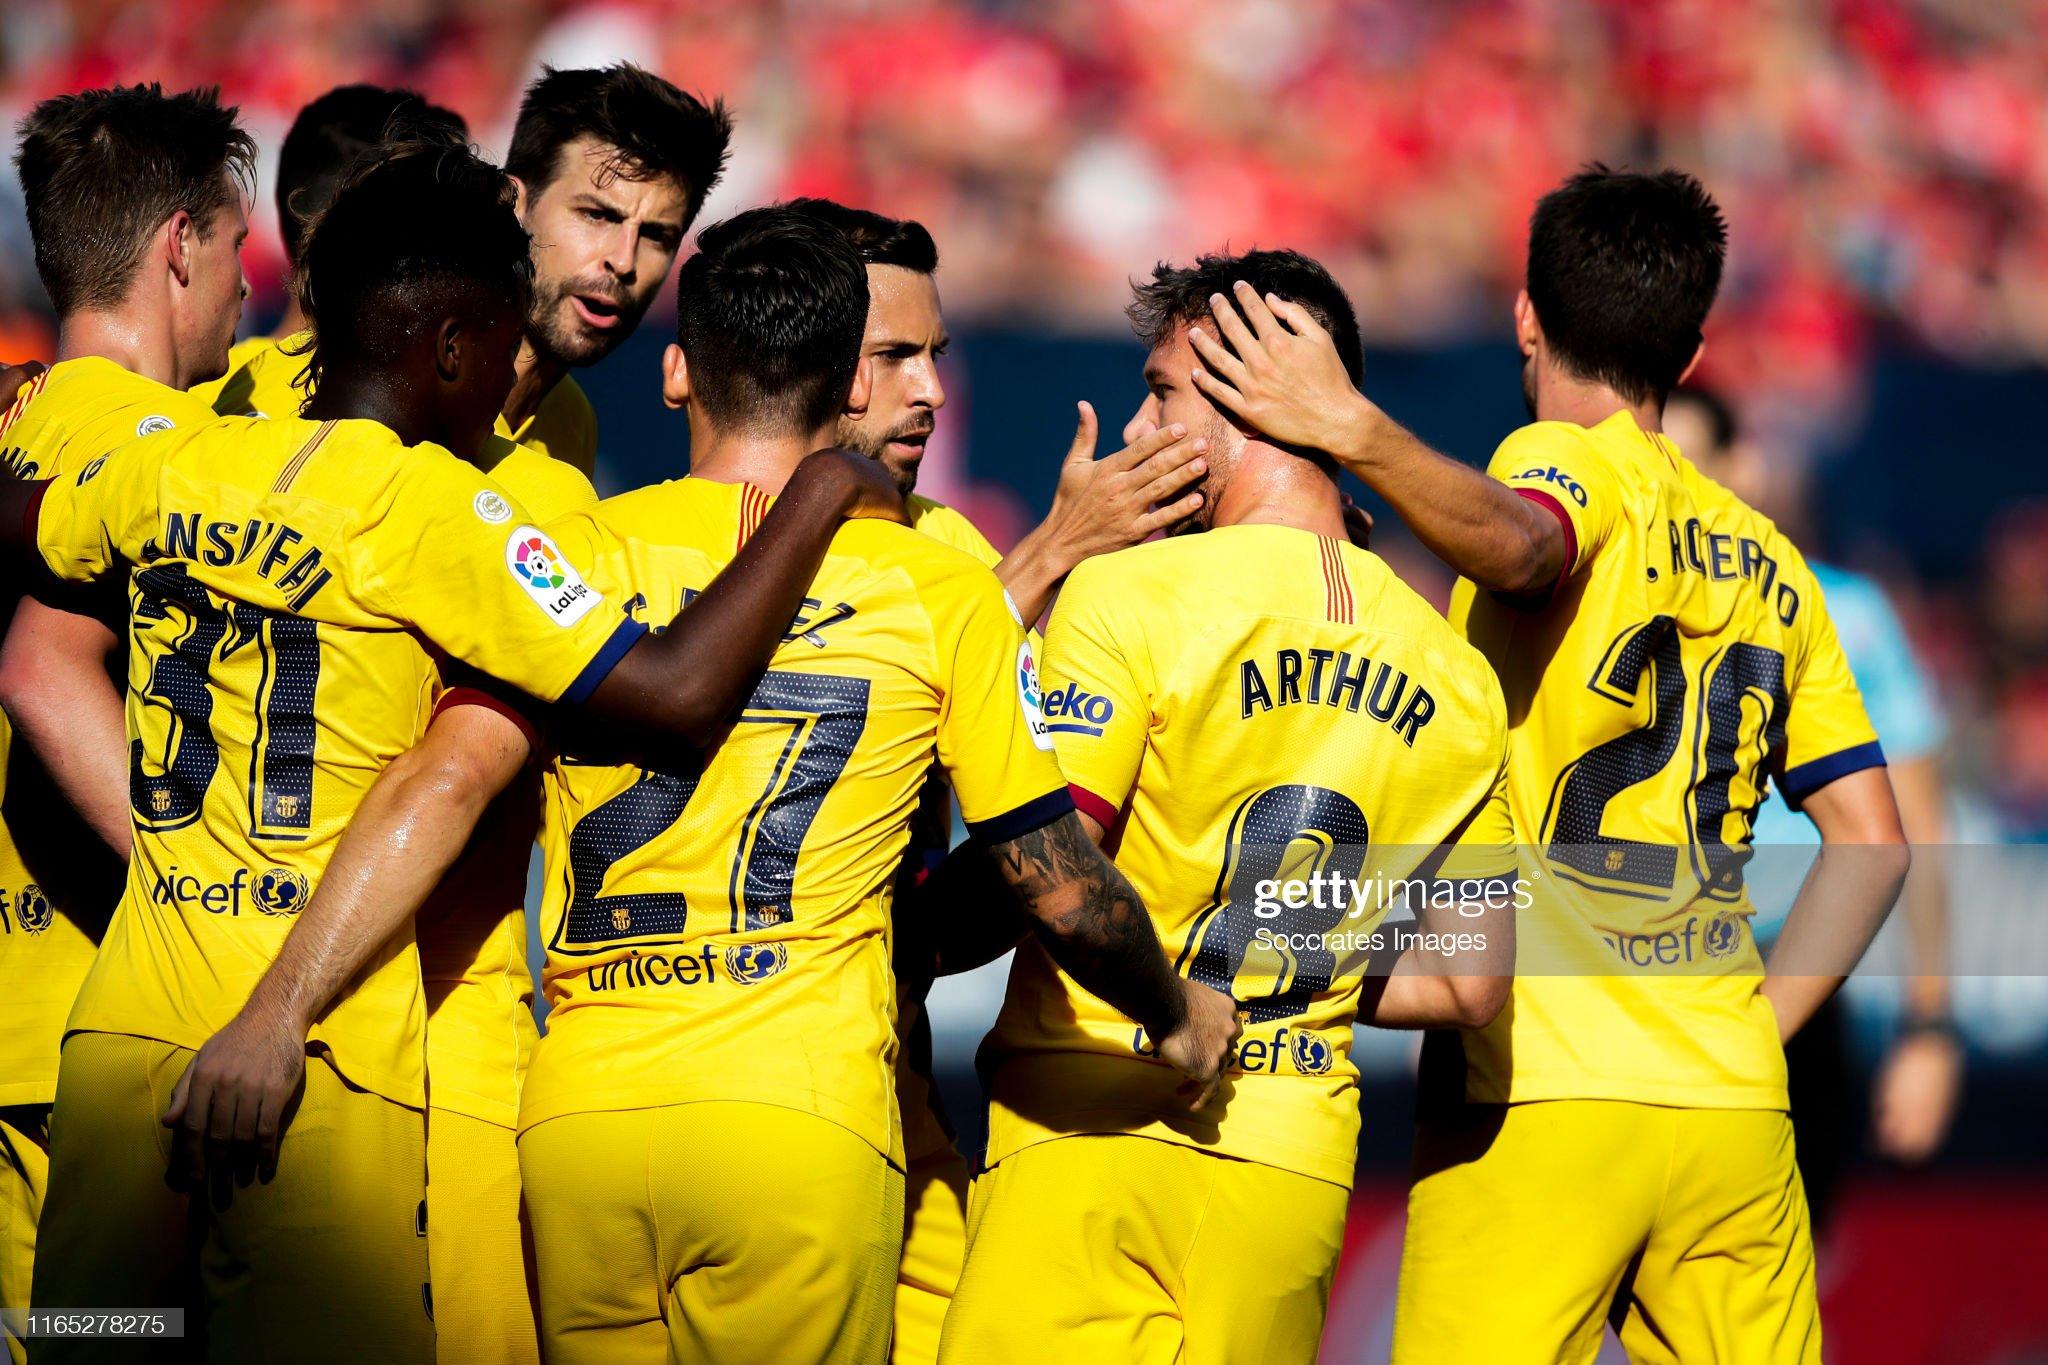 صور مباراة : أوساسونا - برشلونة 2-2 ( 31-08-2019 )  Ansu-fati-of-fc-barcelona-sergio-busquets-of-fc-barcelona-jordi-alba-picture-id1165278275?s=2048x2048